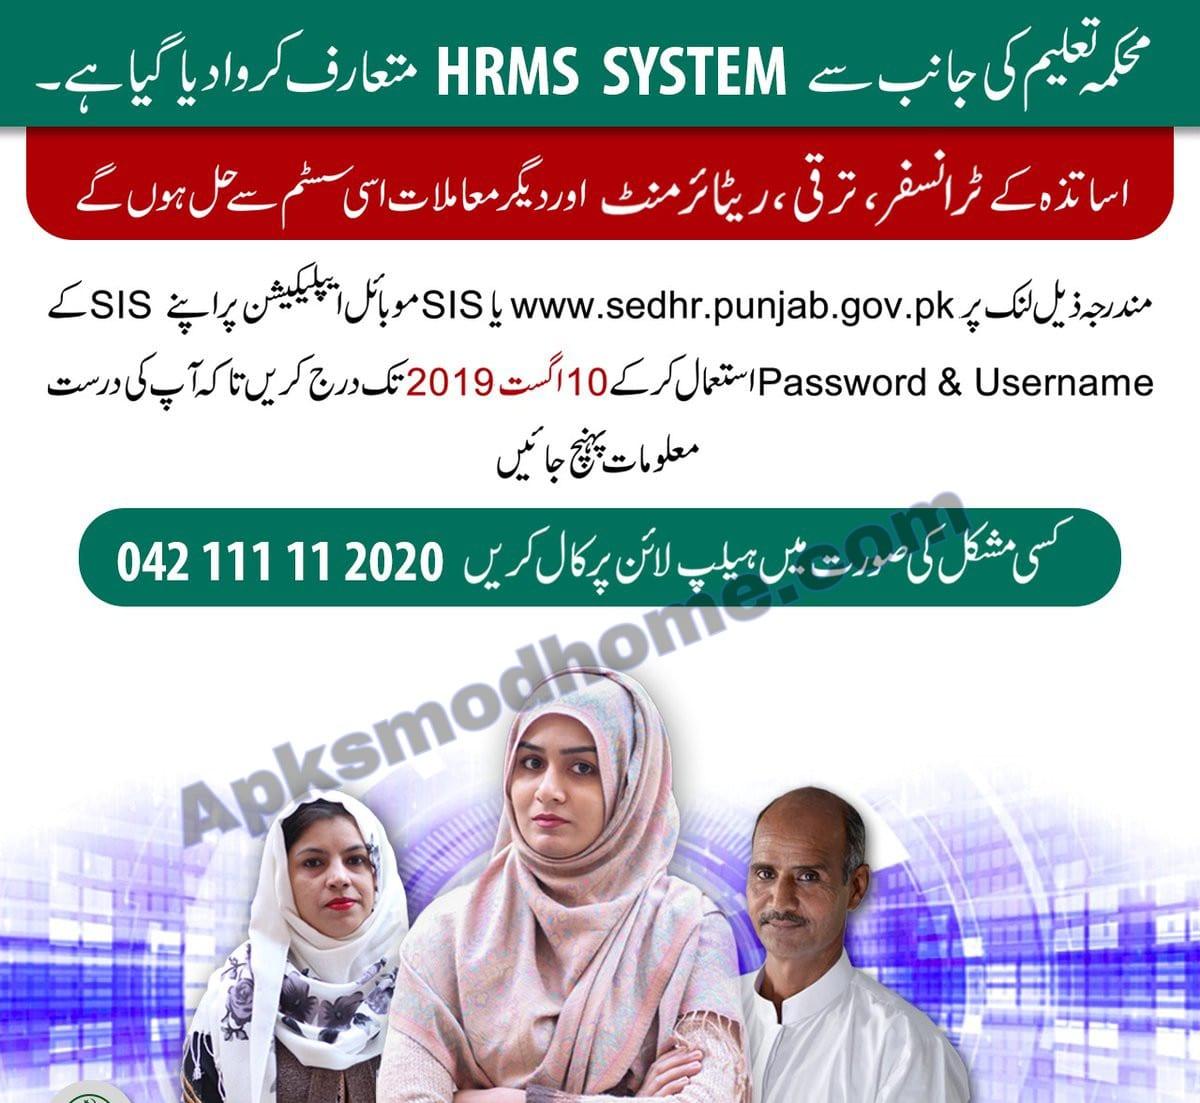 sedhr punjab gov pk full details & guide